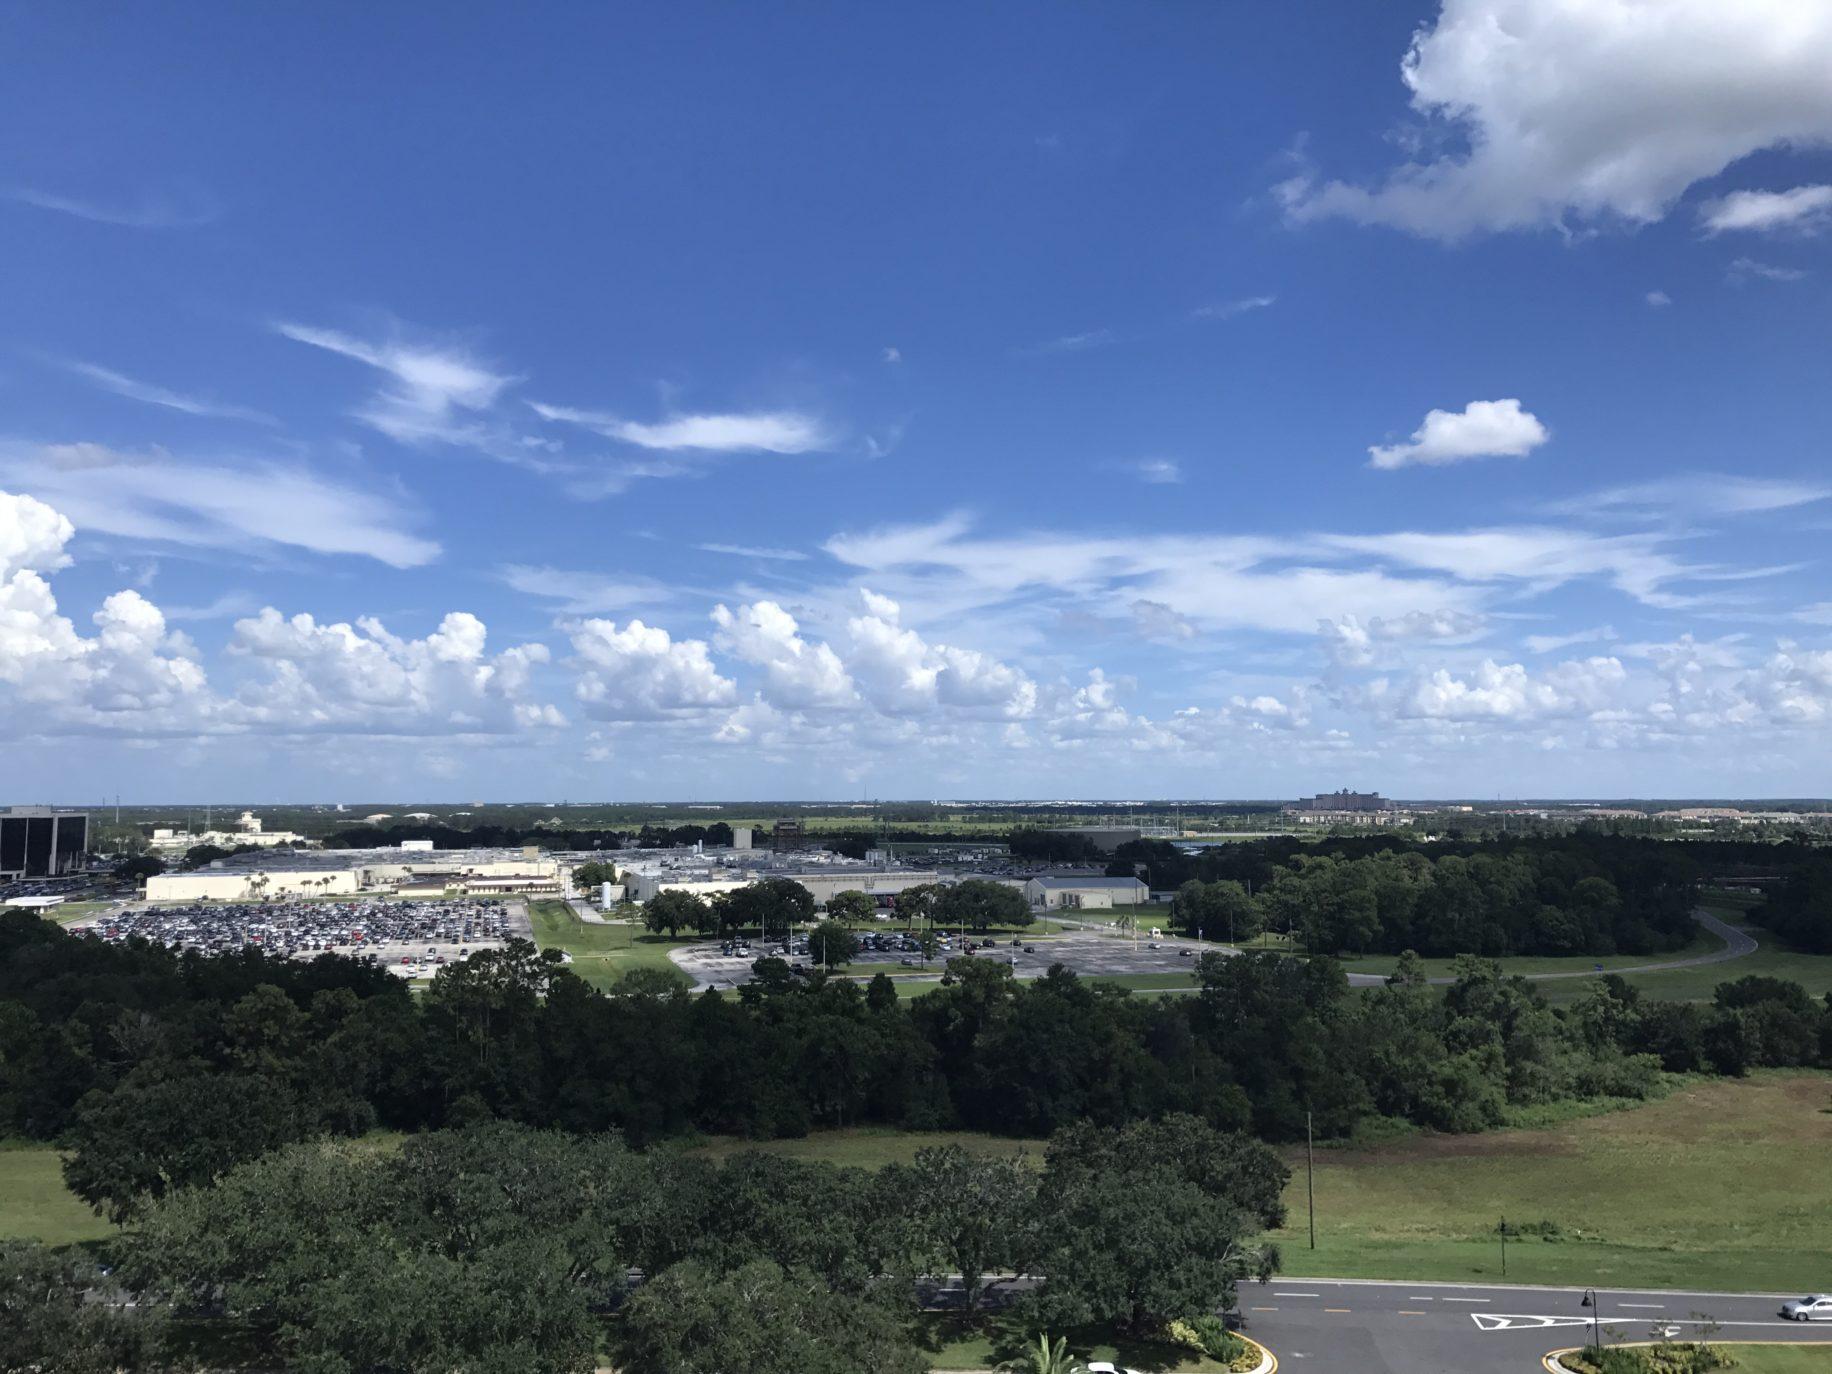 Nice views from the Orlando Eye  Image: Dakster Sullivan